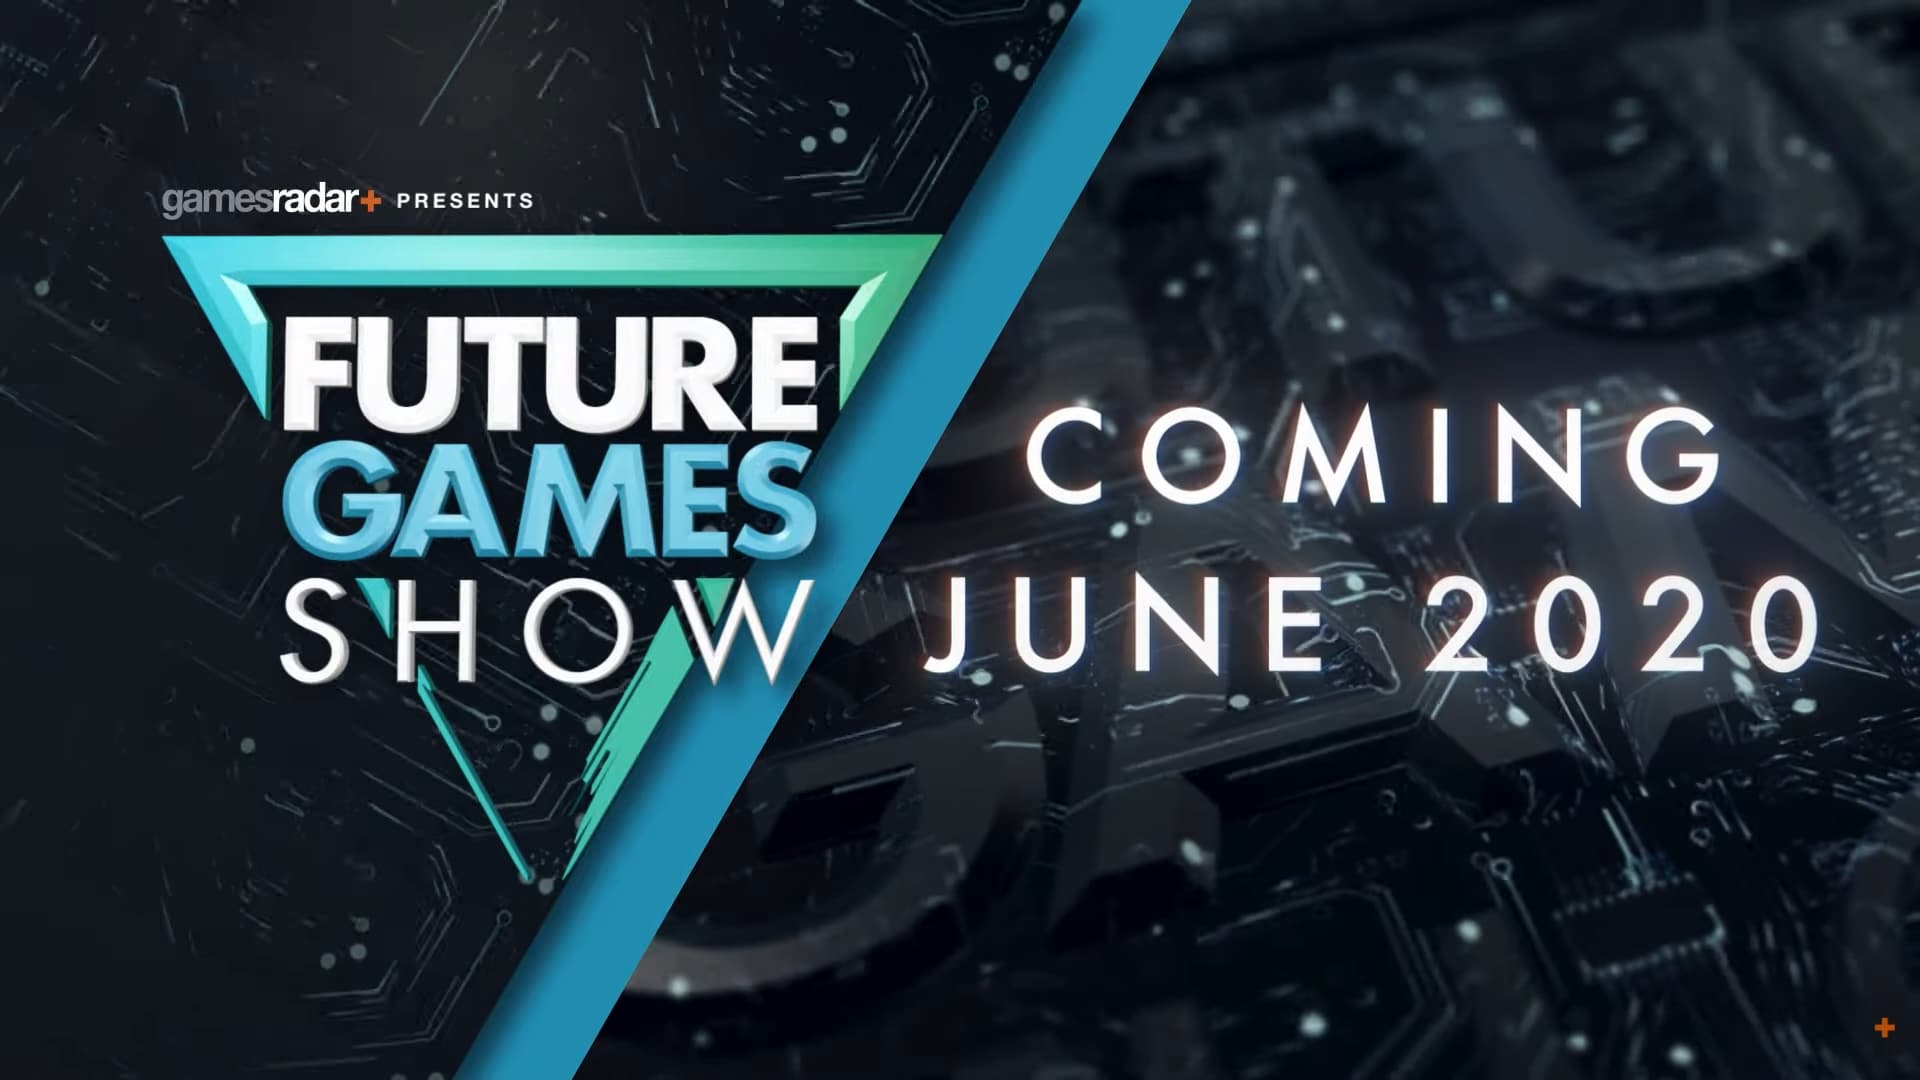 На Future Games Show 2020 покажут более 30 игр от Square Enix, Deep Silver, Devolver Digital и других